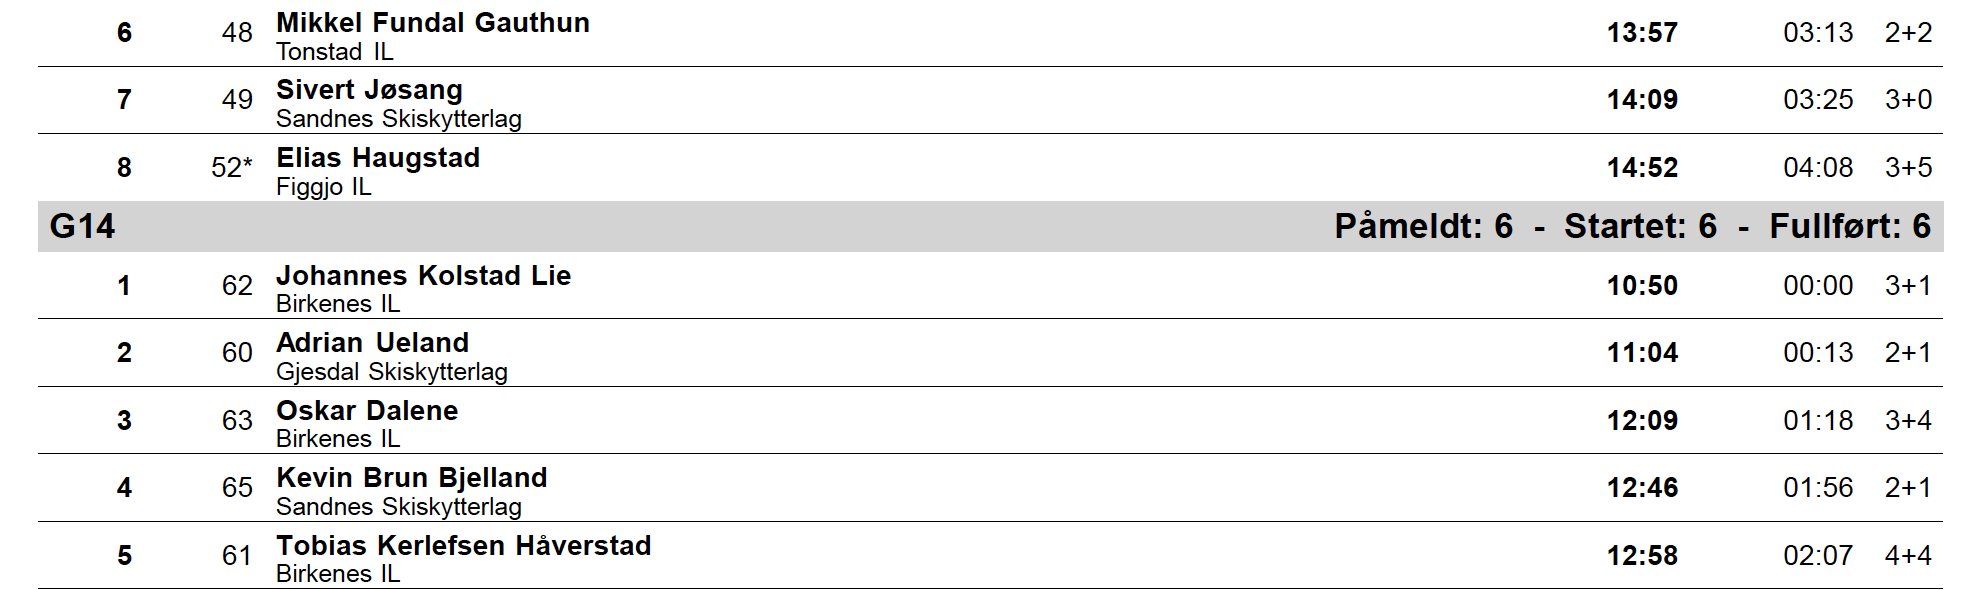 Macintosh HD:Users:Lsir:Dropbox:Skjermbilder:Skjermbilde 2019-01-20 22.09.43.png